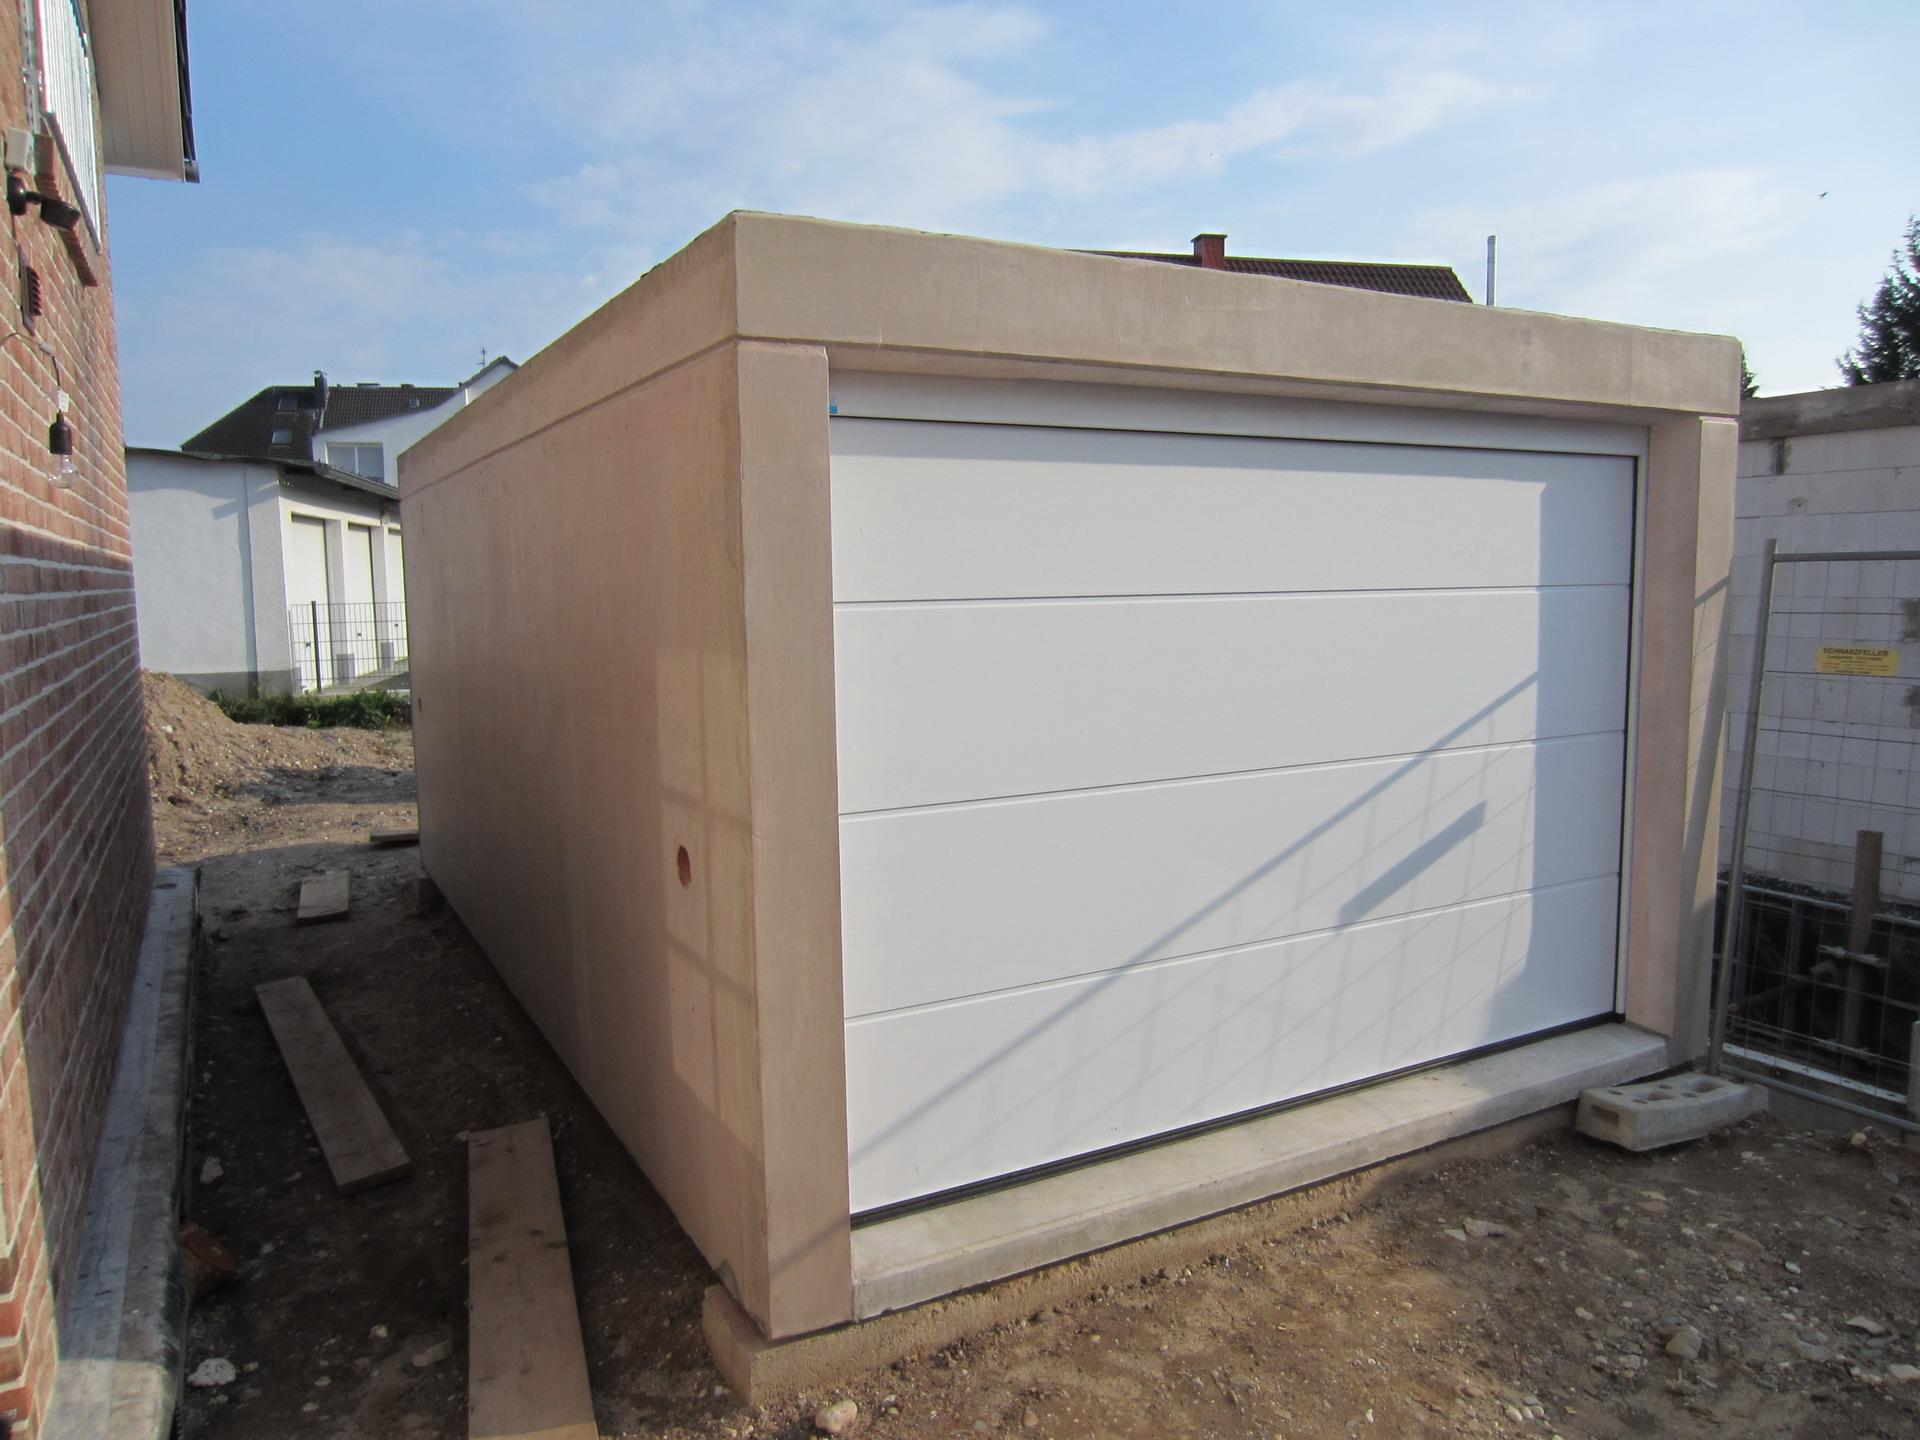 tahoma box wir bauen 39 am lusthaus 39. Black Bedroom Furniture Sets. Home Design Ideas